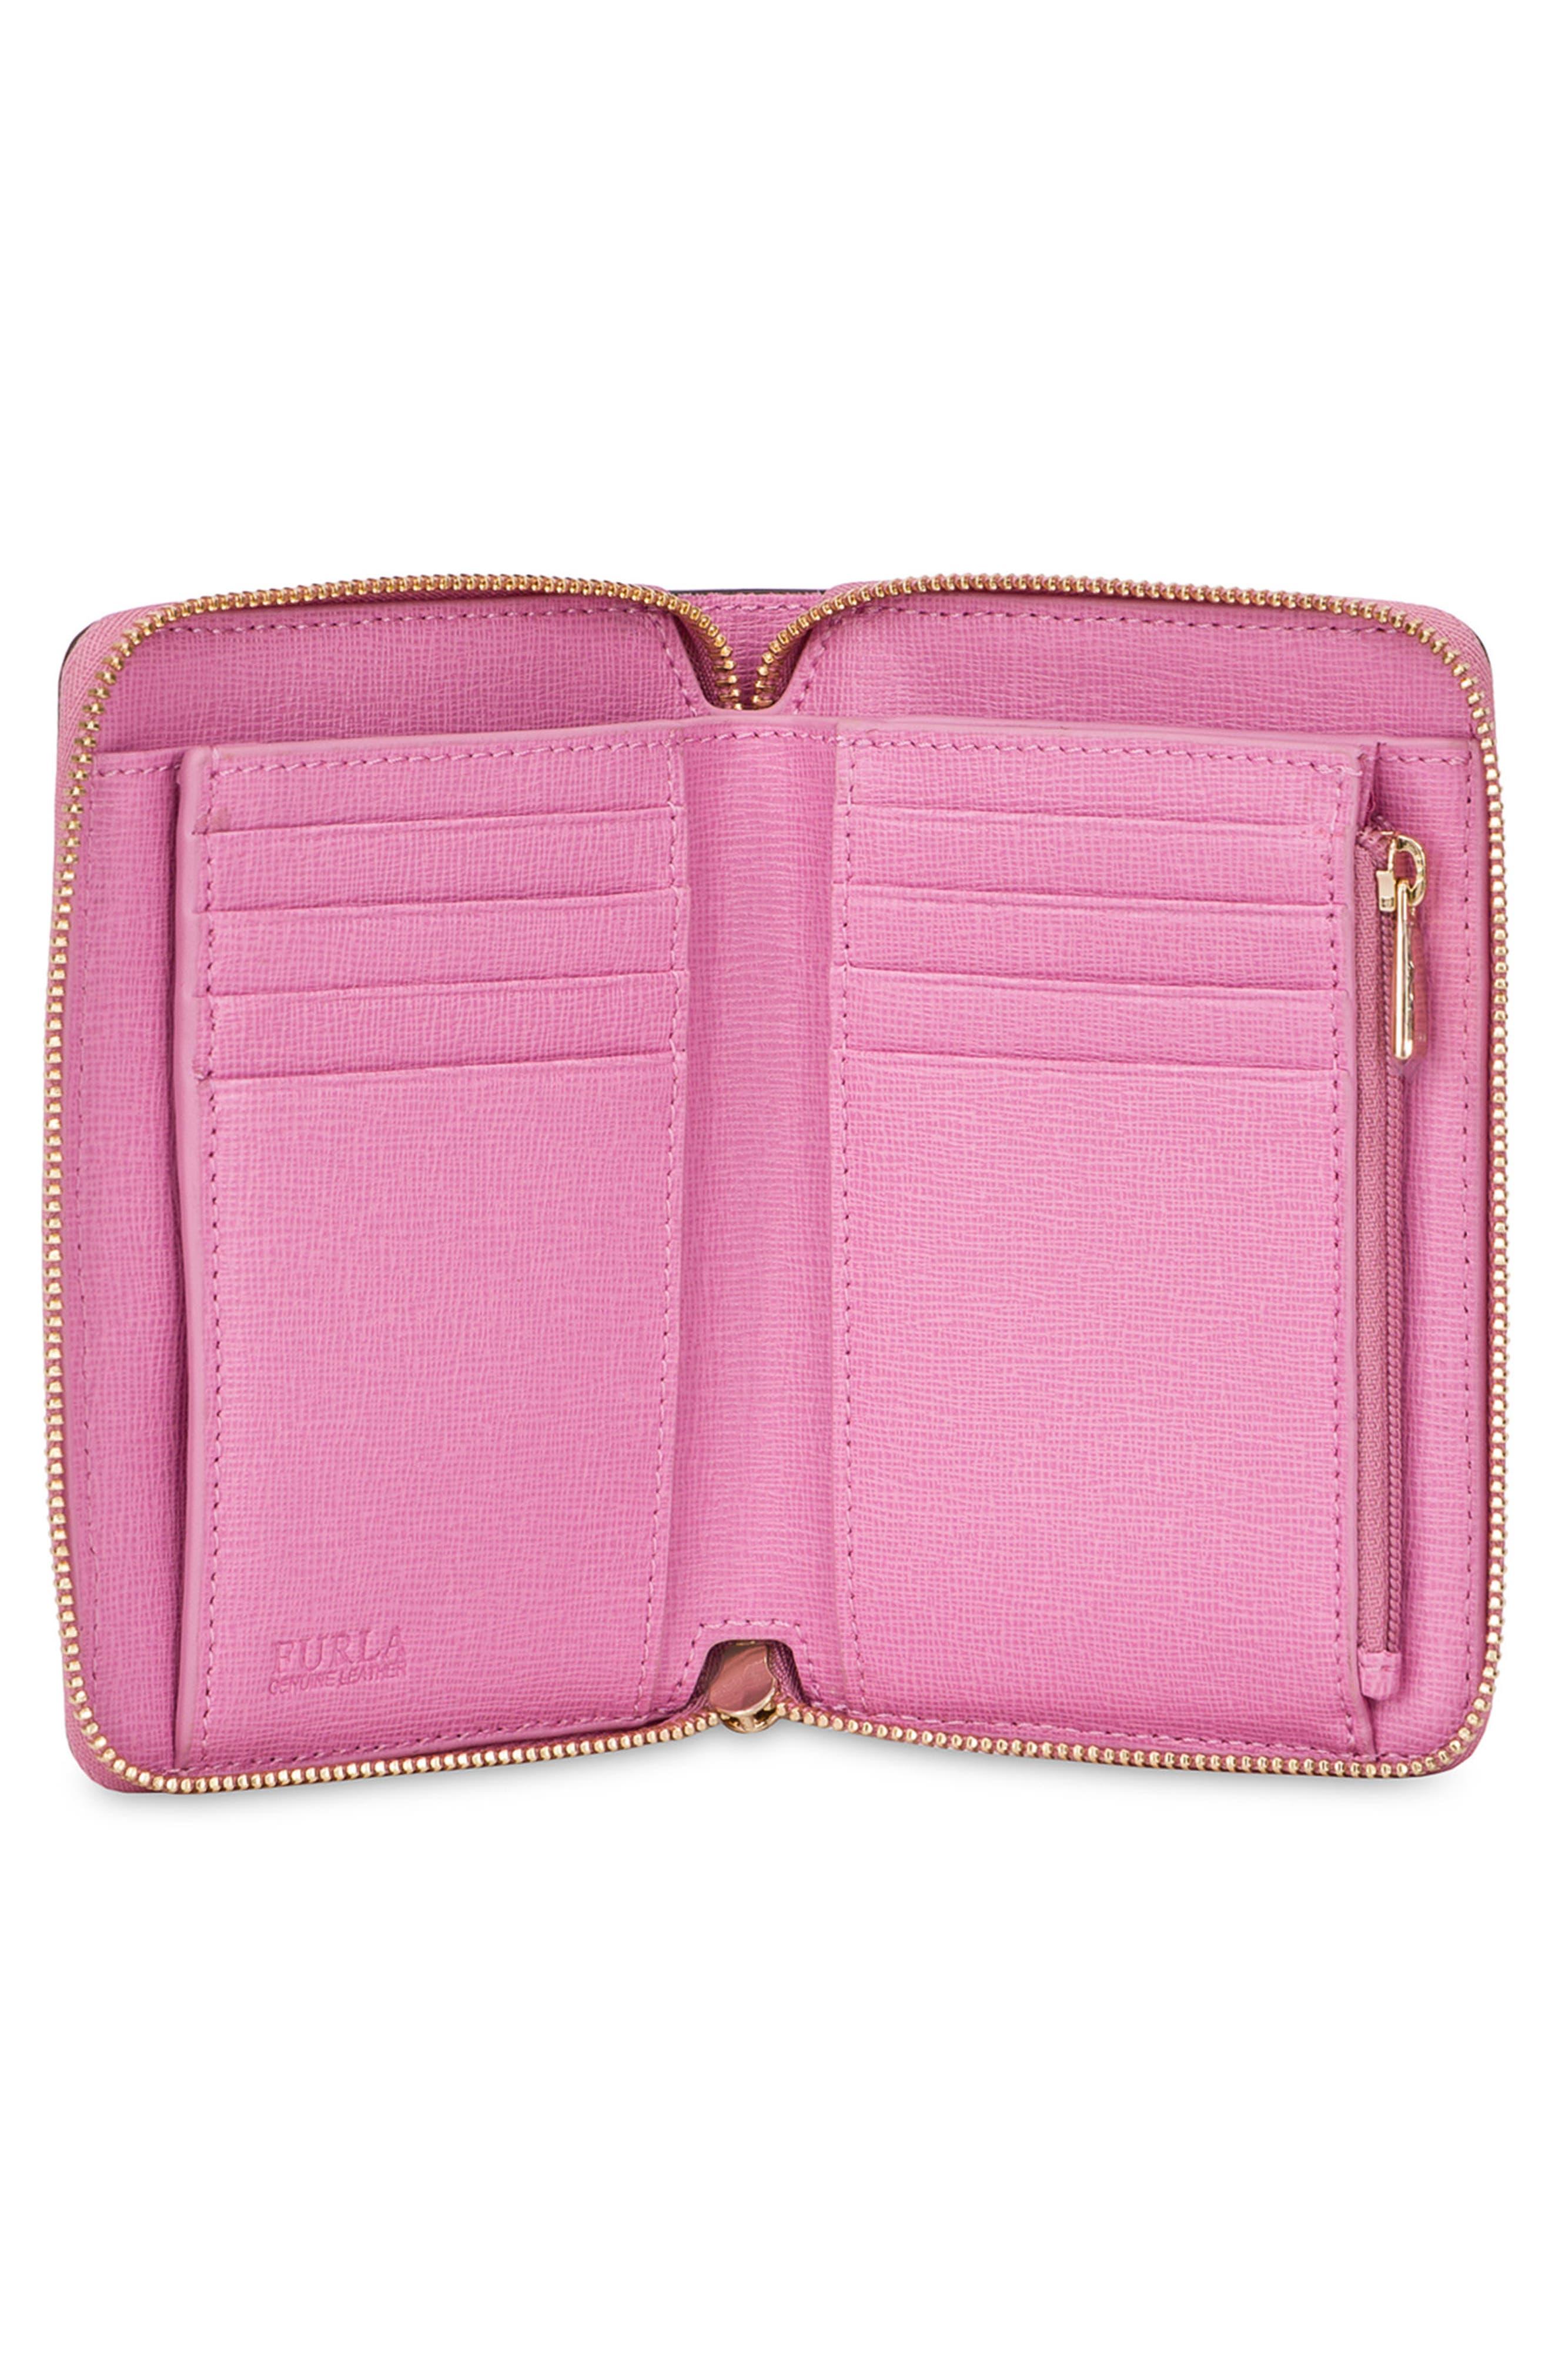 Medium Babylon Saffiano Leather Zip Around Wallet,                             Alternate thumbnail 5, color,